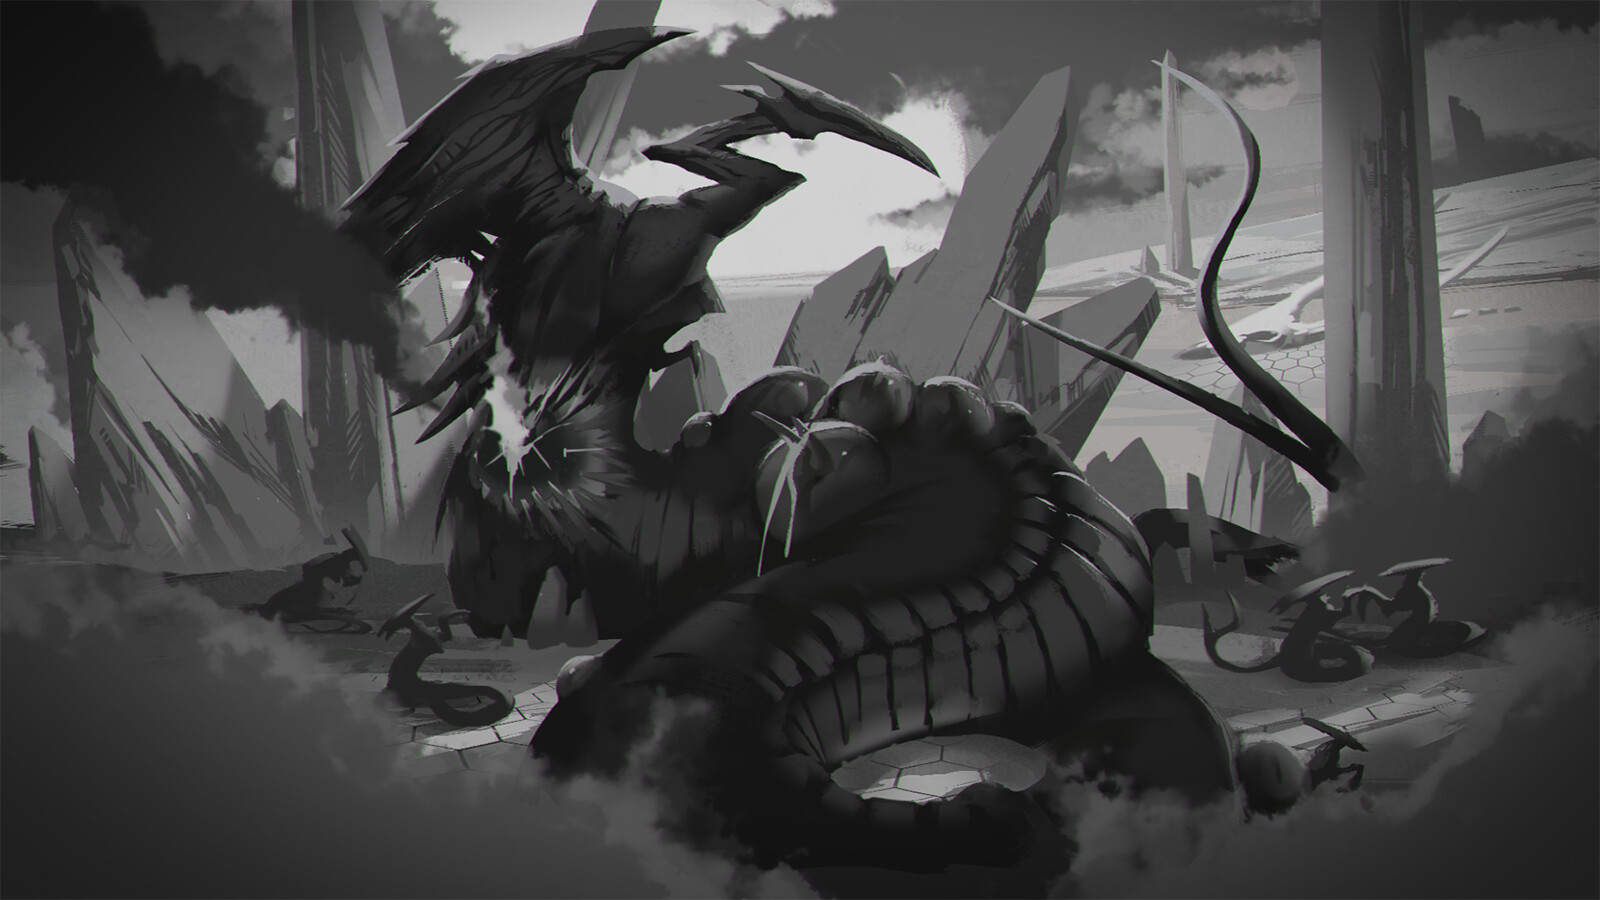 Black and white render